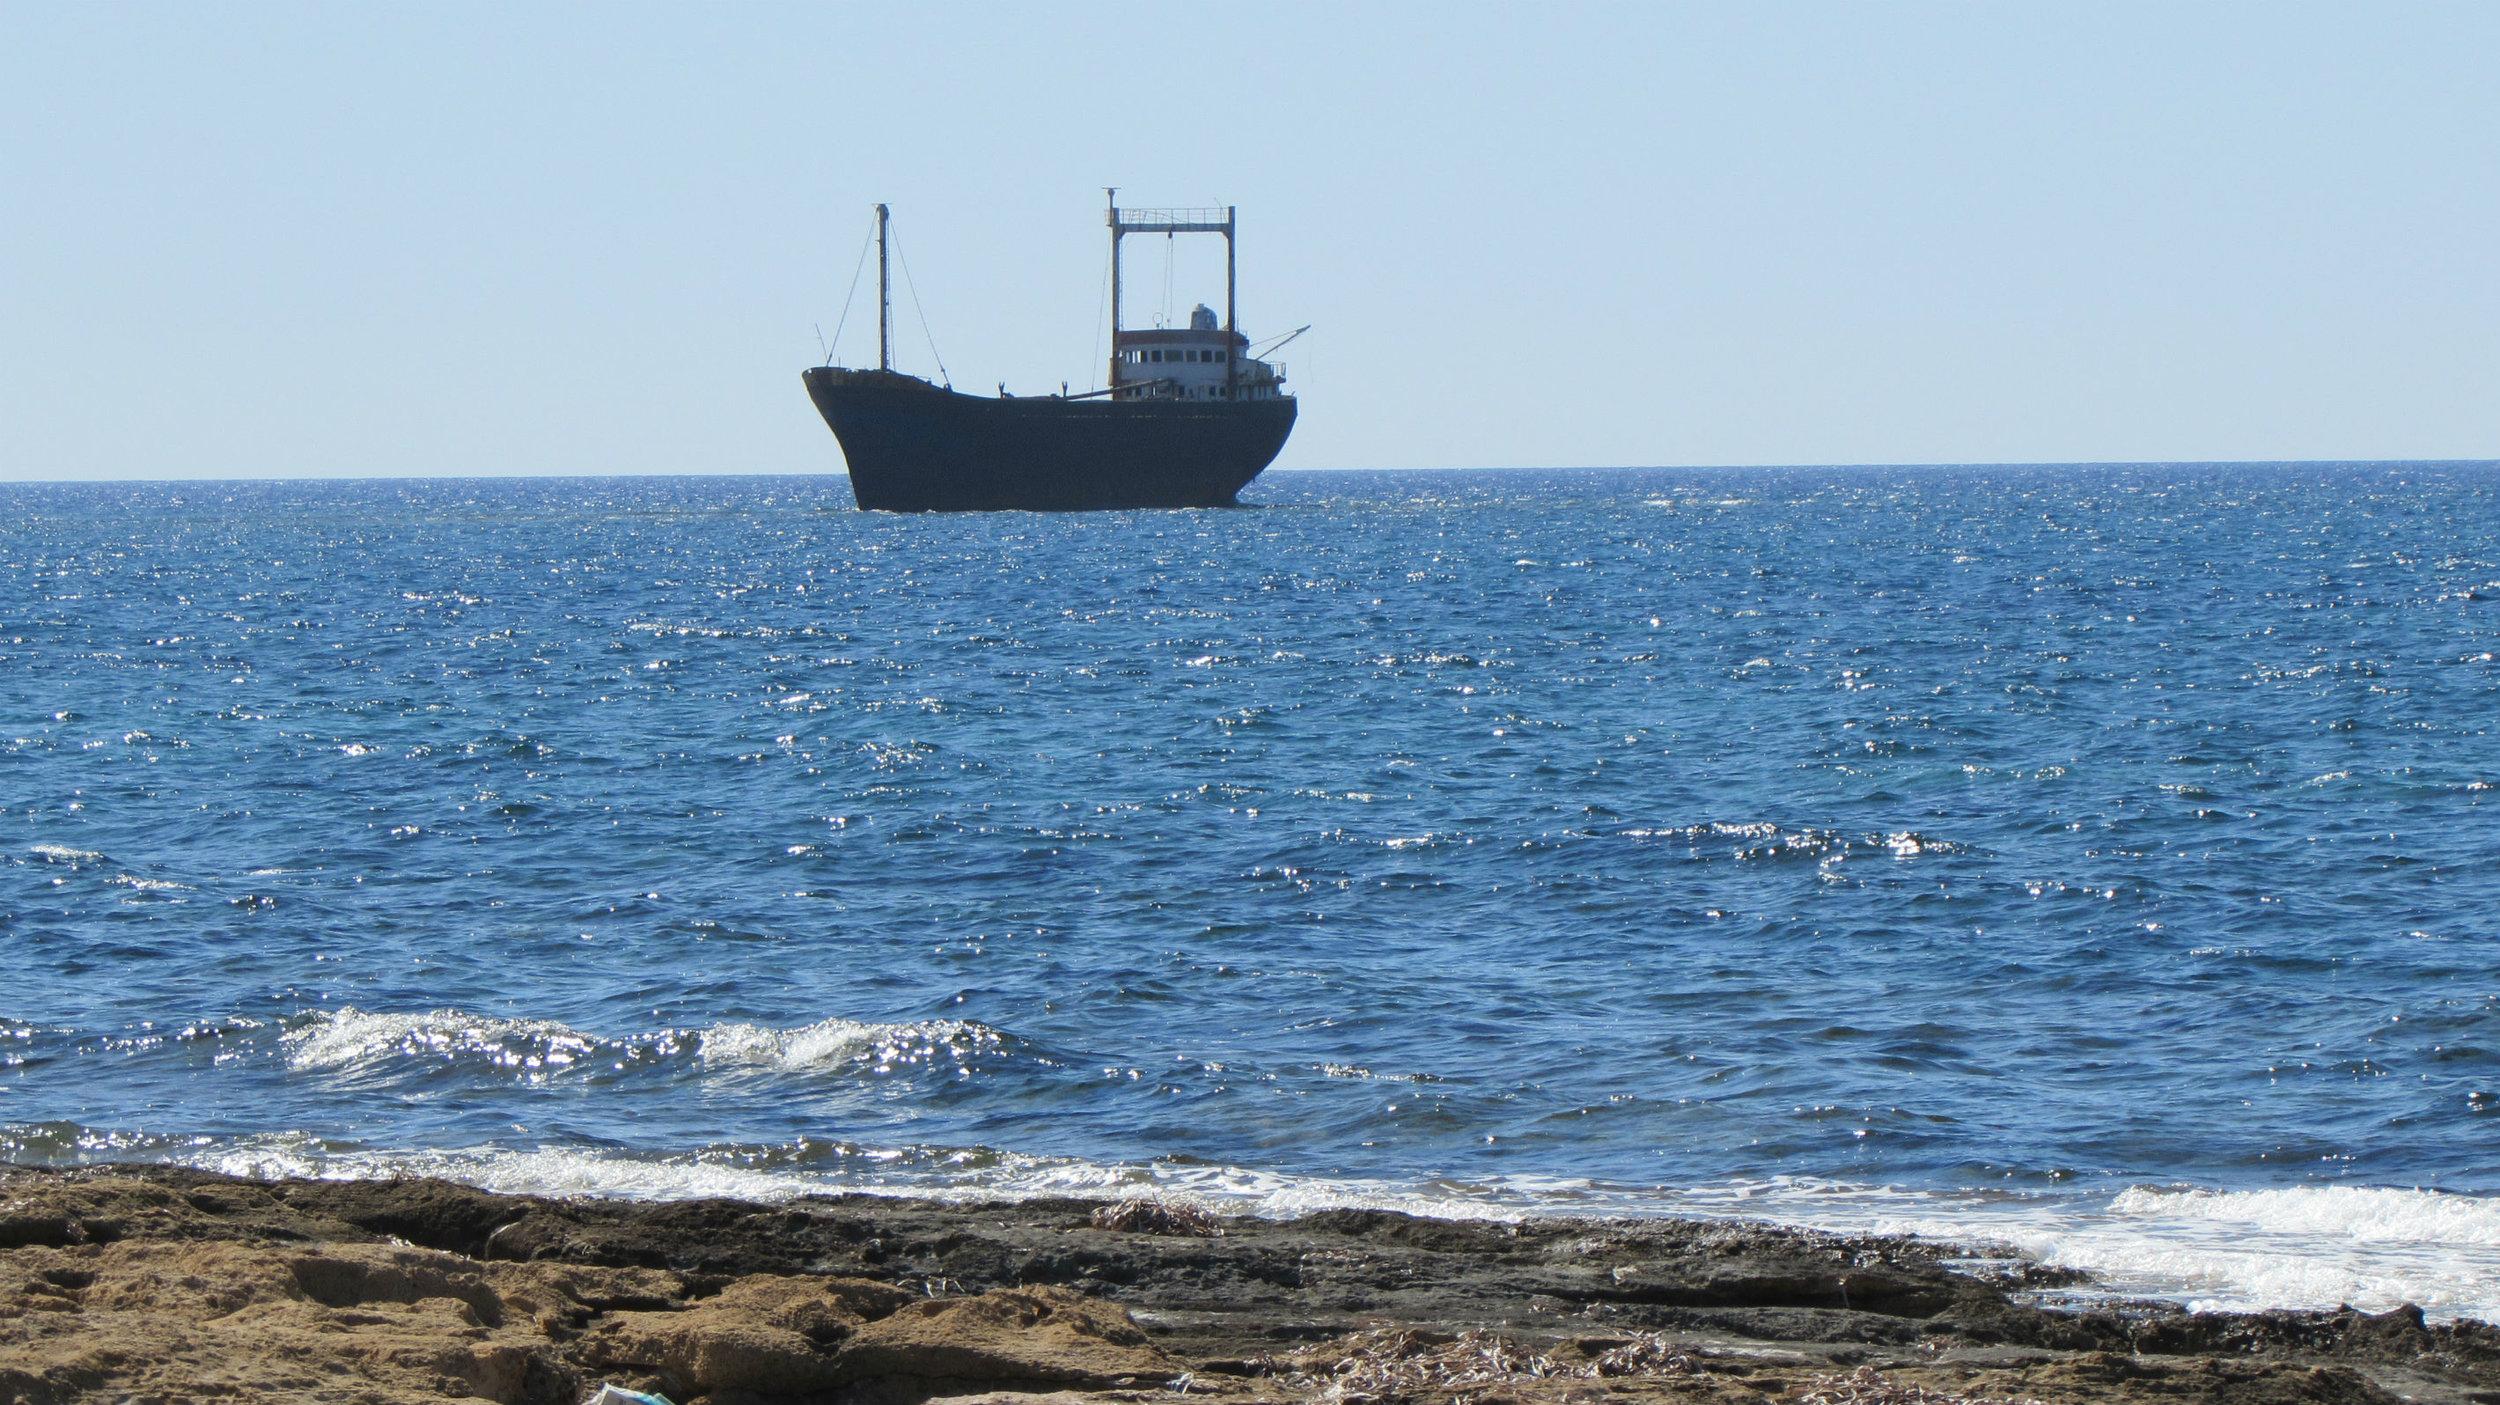 Shipwreck MV Demetrios II, landmark of the Paphos coast. Was the captain drunk when his ship hit the reef?